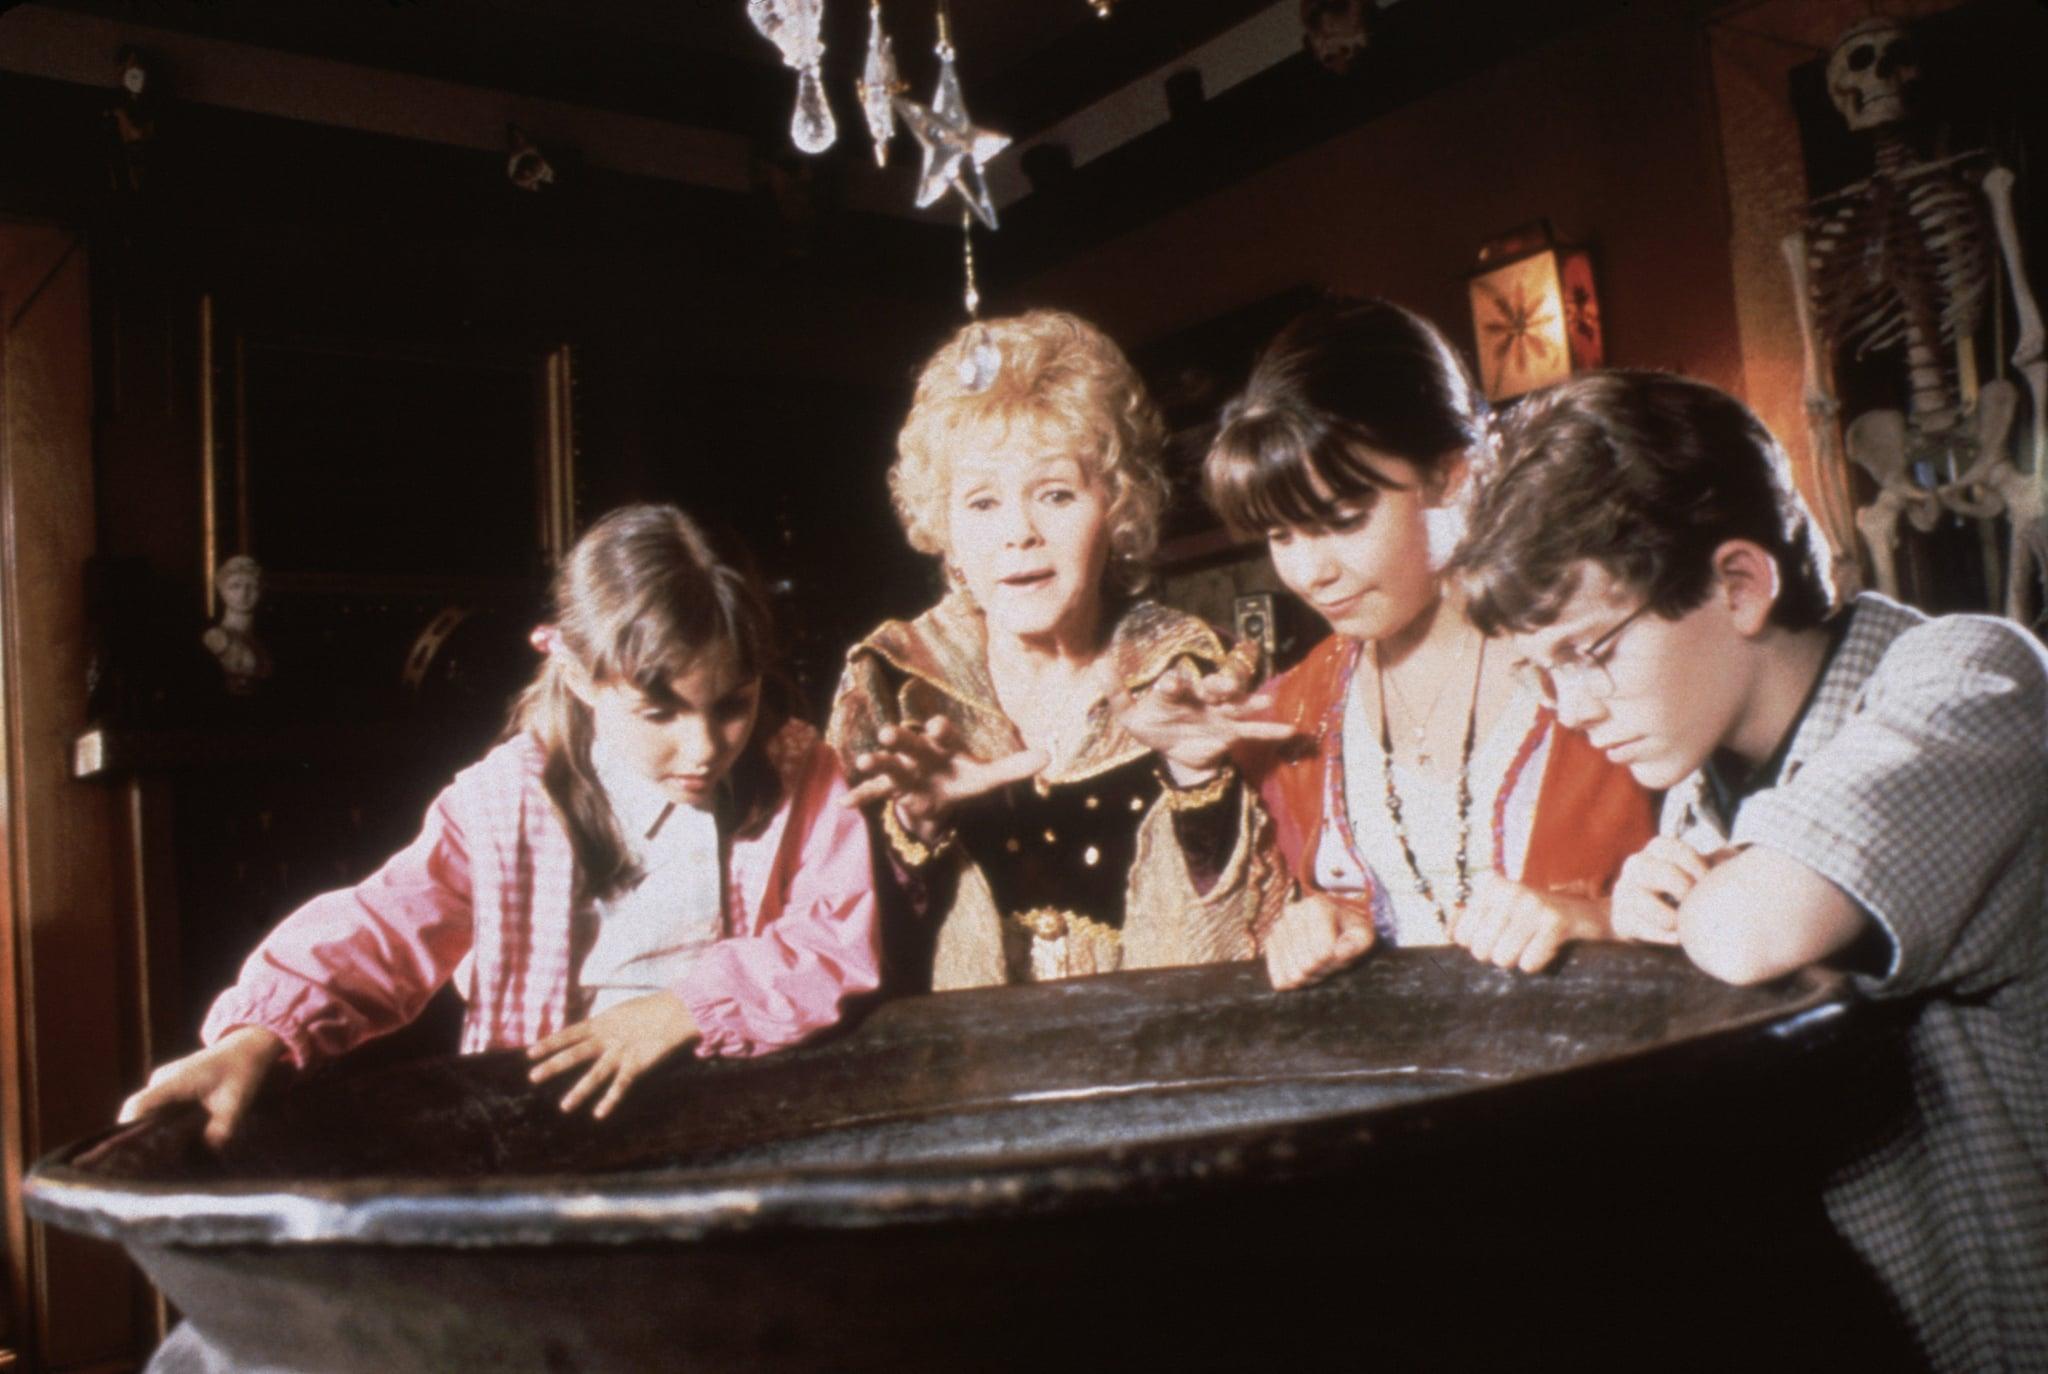 HALLOWEENTOWN, (from left): Emily Roeske, Debbie Reynolds, Kimberly J. Brown, Joey Zimmerman, 1998.  Disney Channel  / Courtesy: Everett Collection